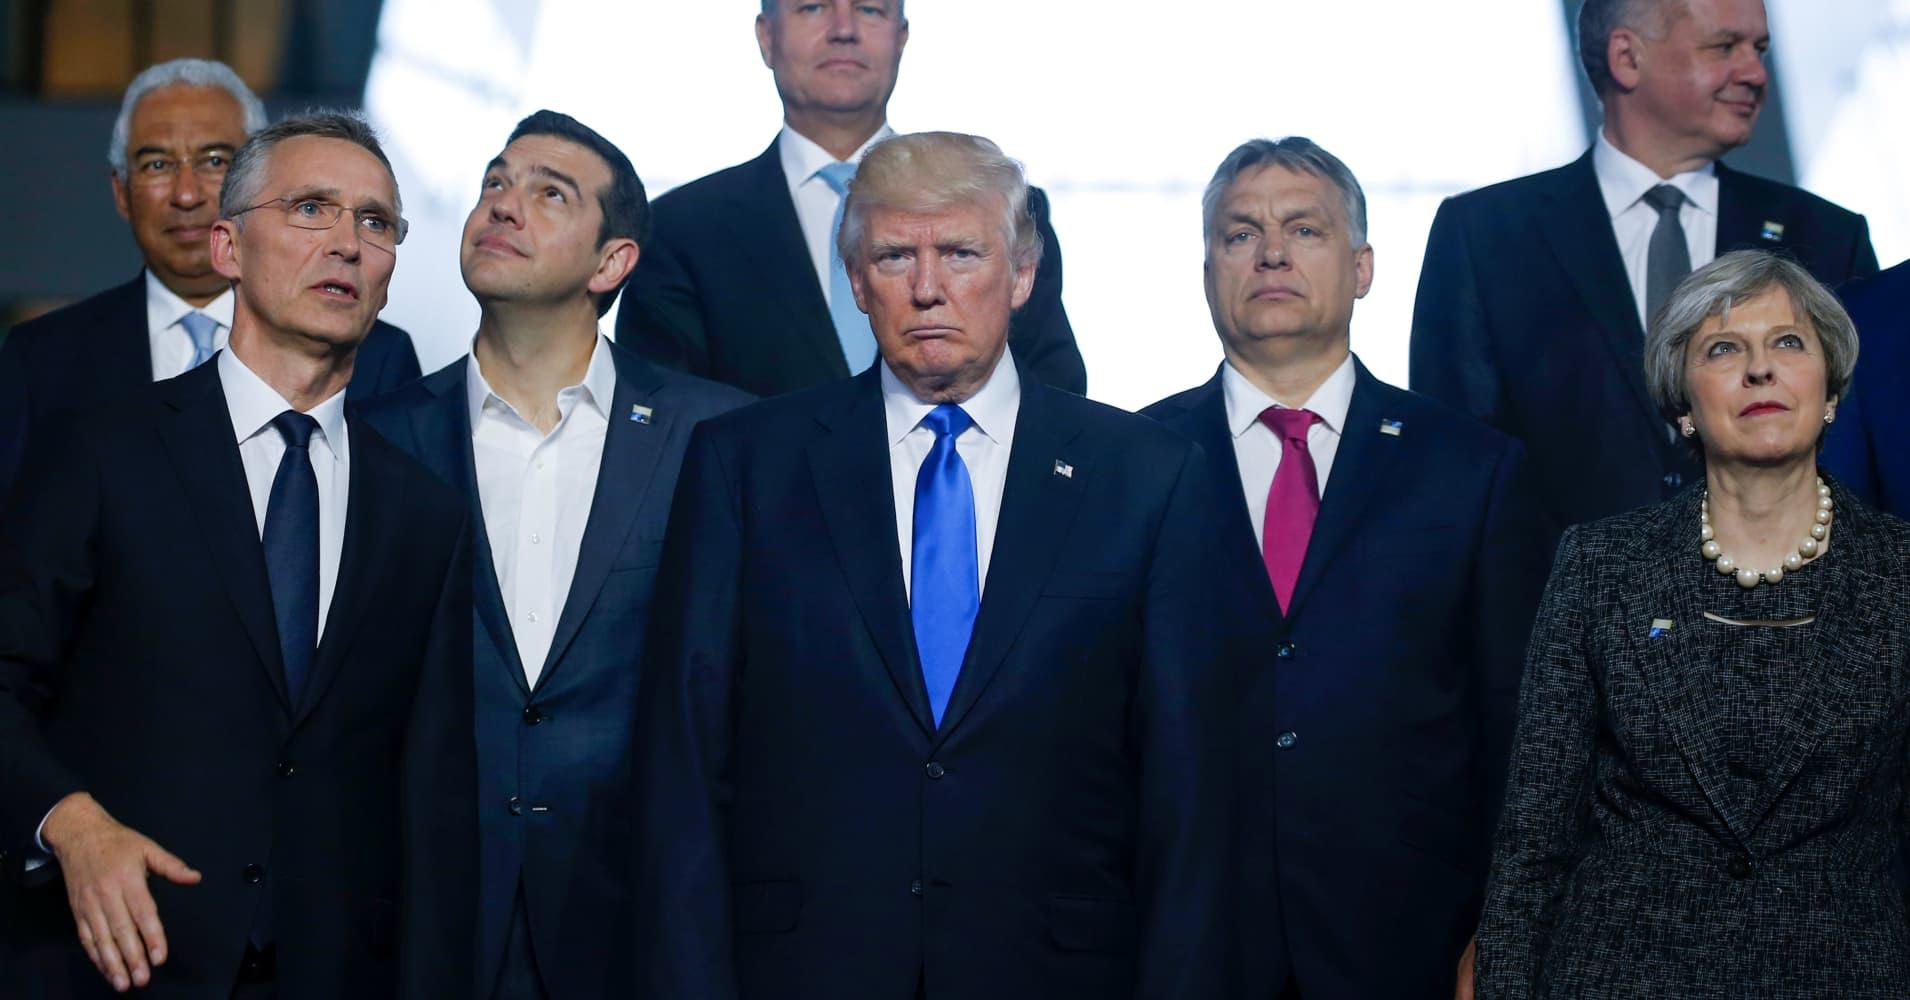 Trump NATO visit gets bad reviews from former ambassadors